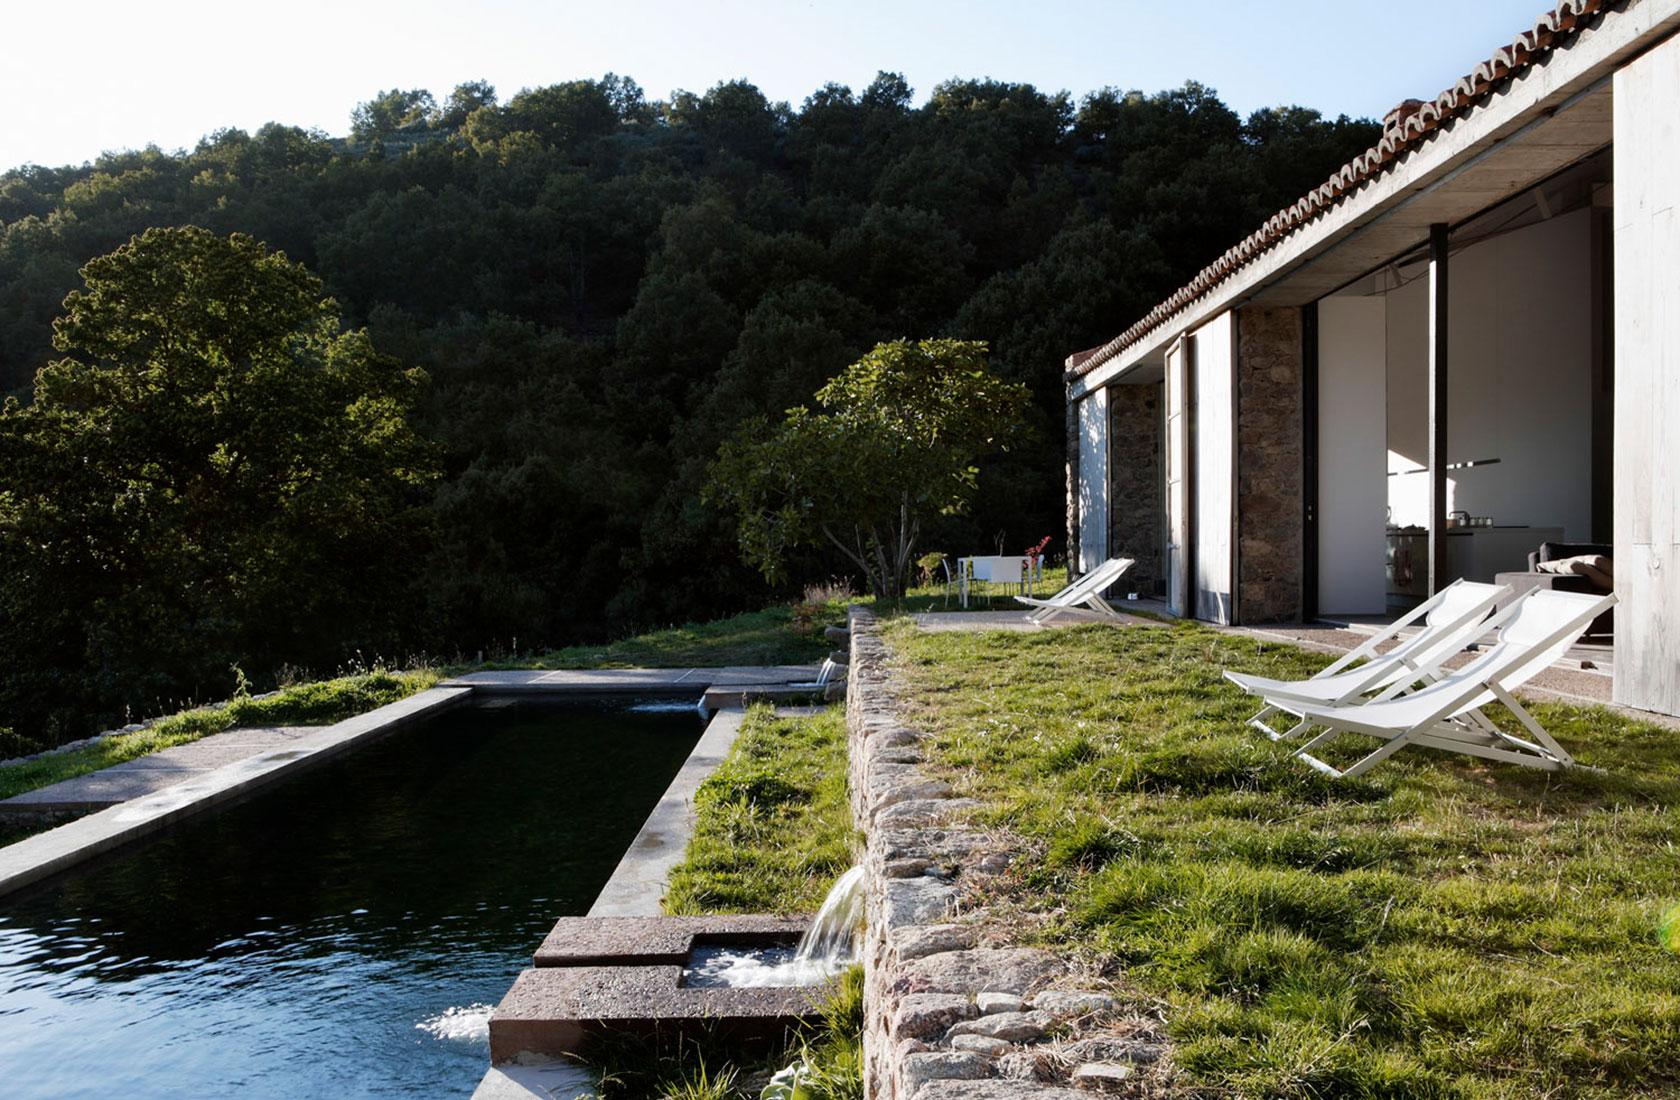 Vista general de la piscina natural de la casa en alquiler Finca en Extremadura